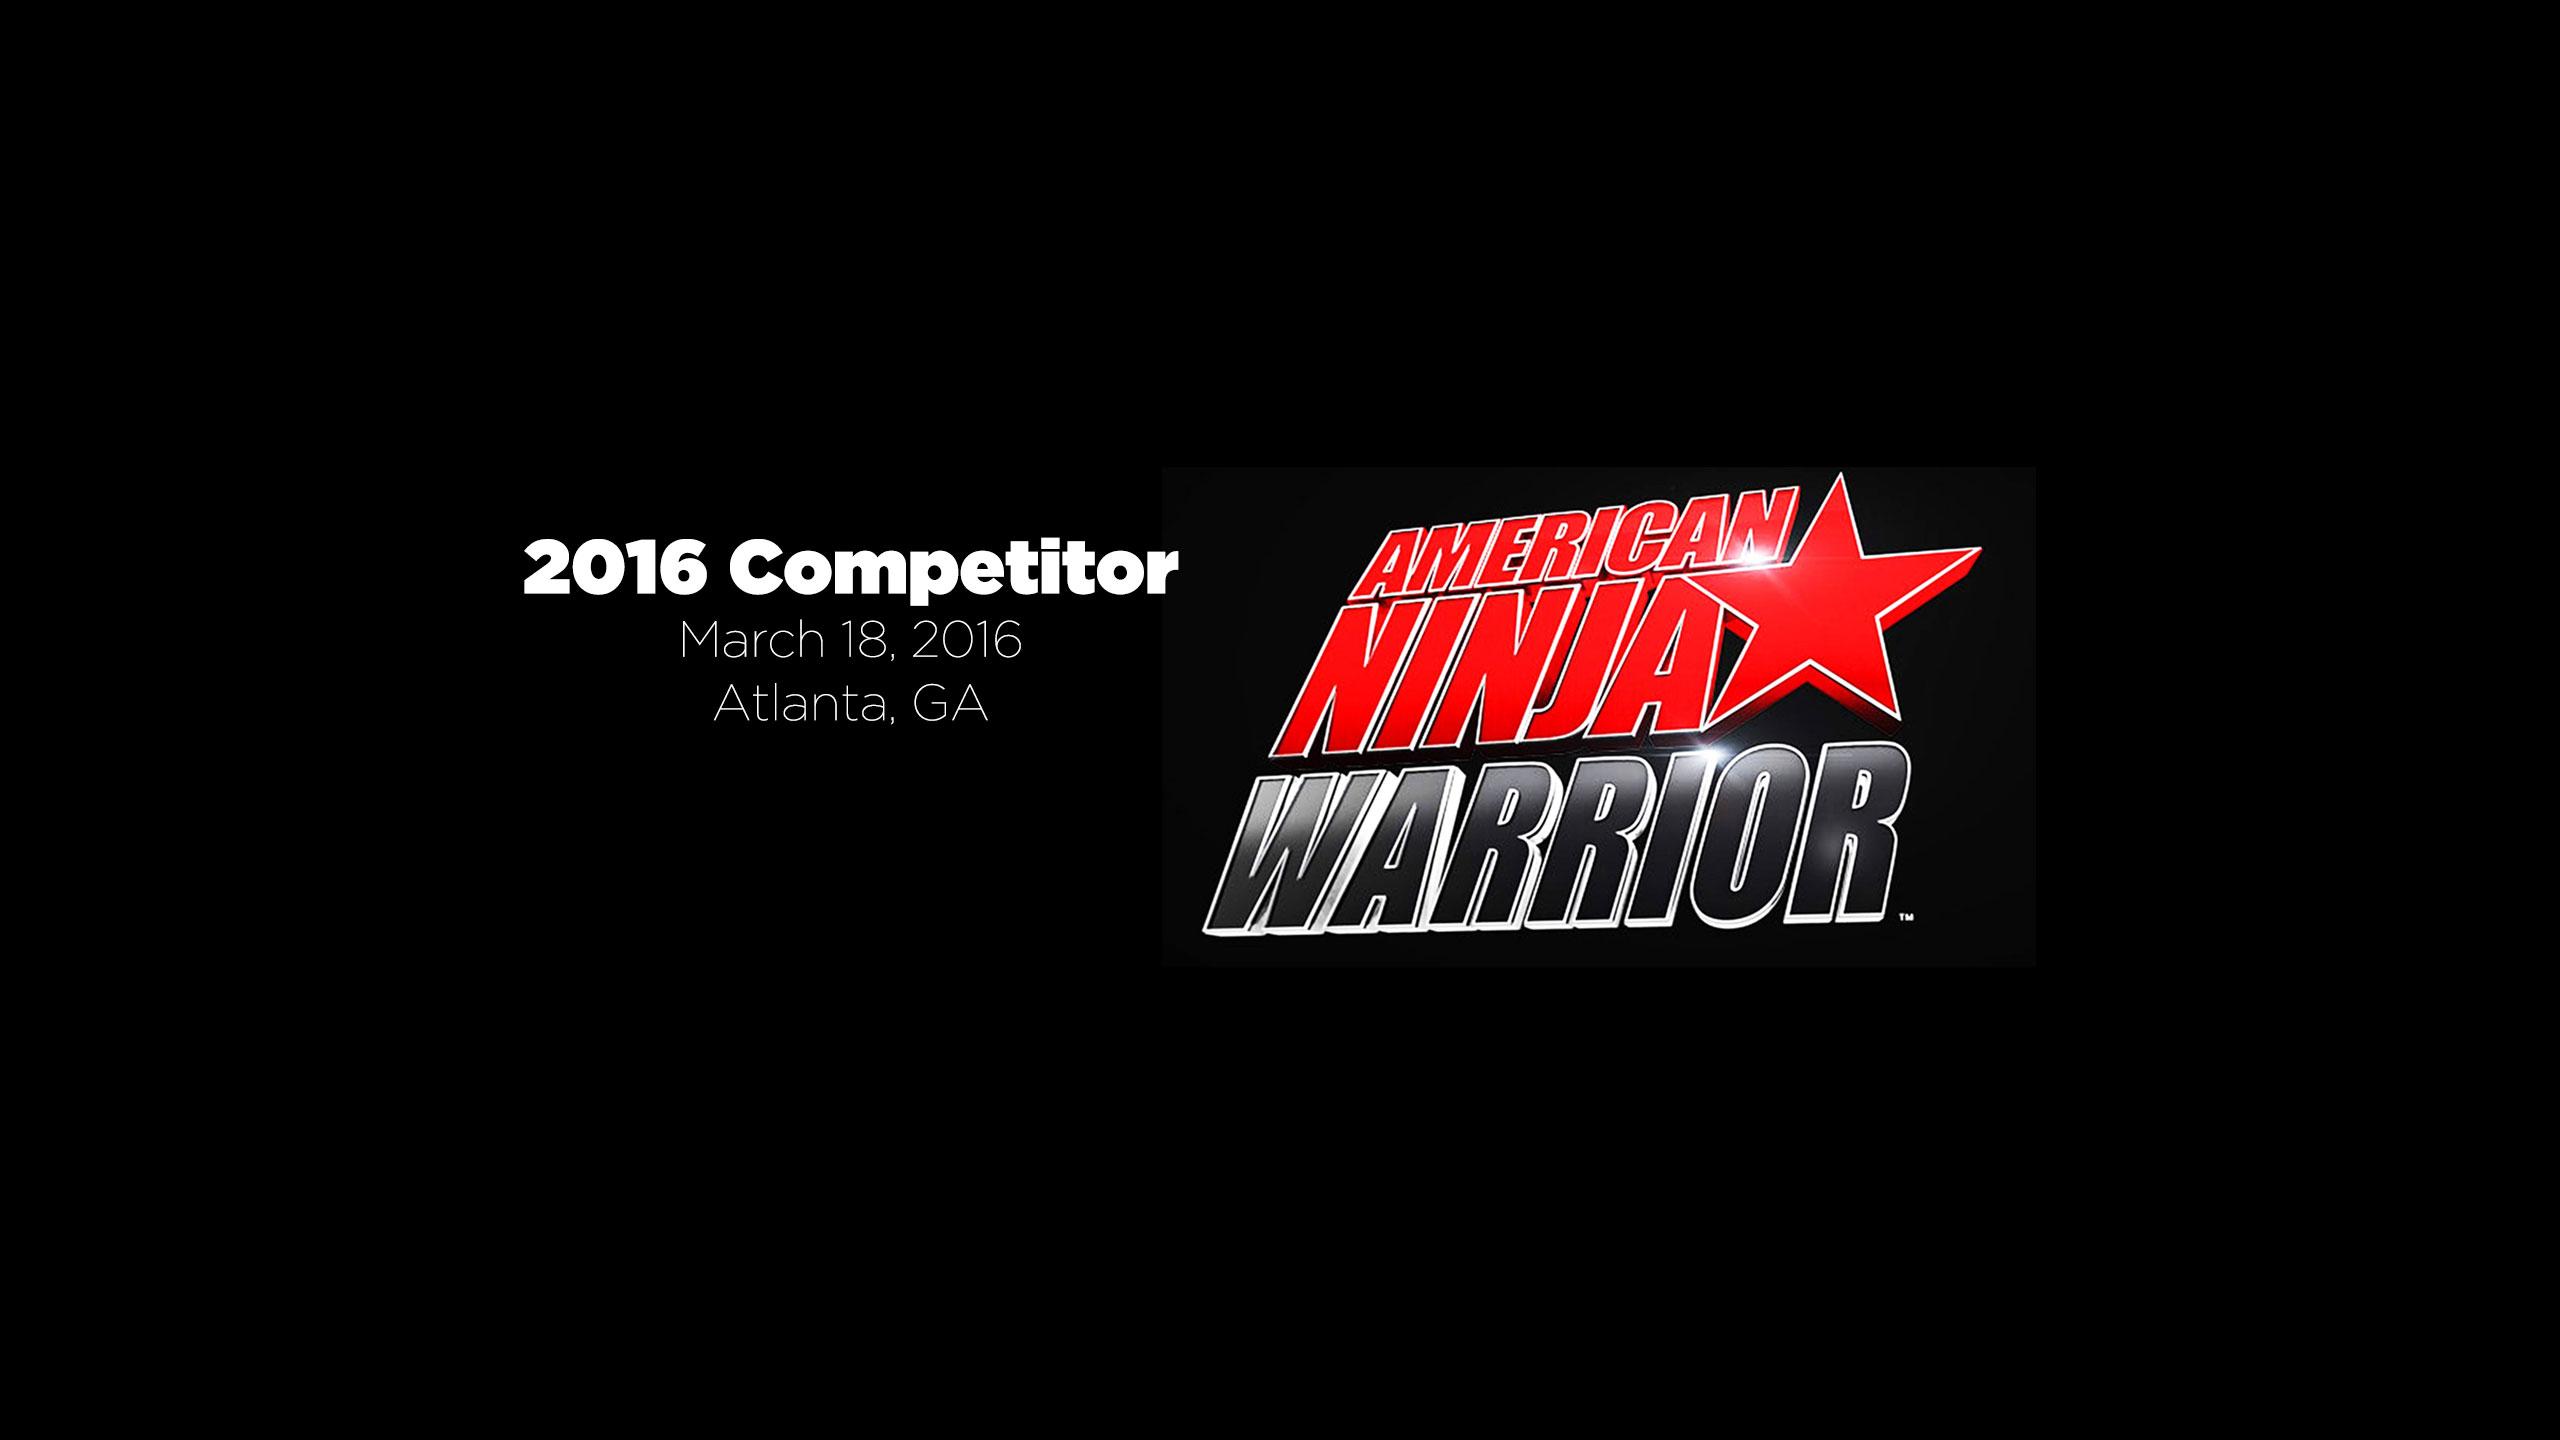 Google American Ninja Warrior